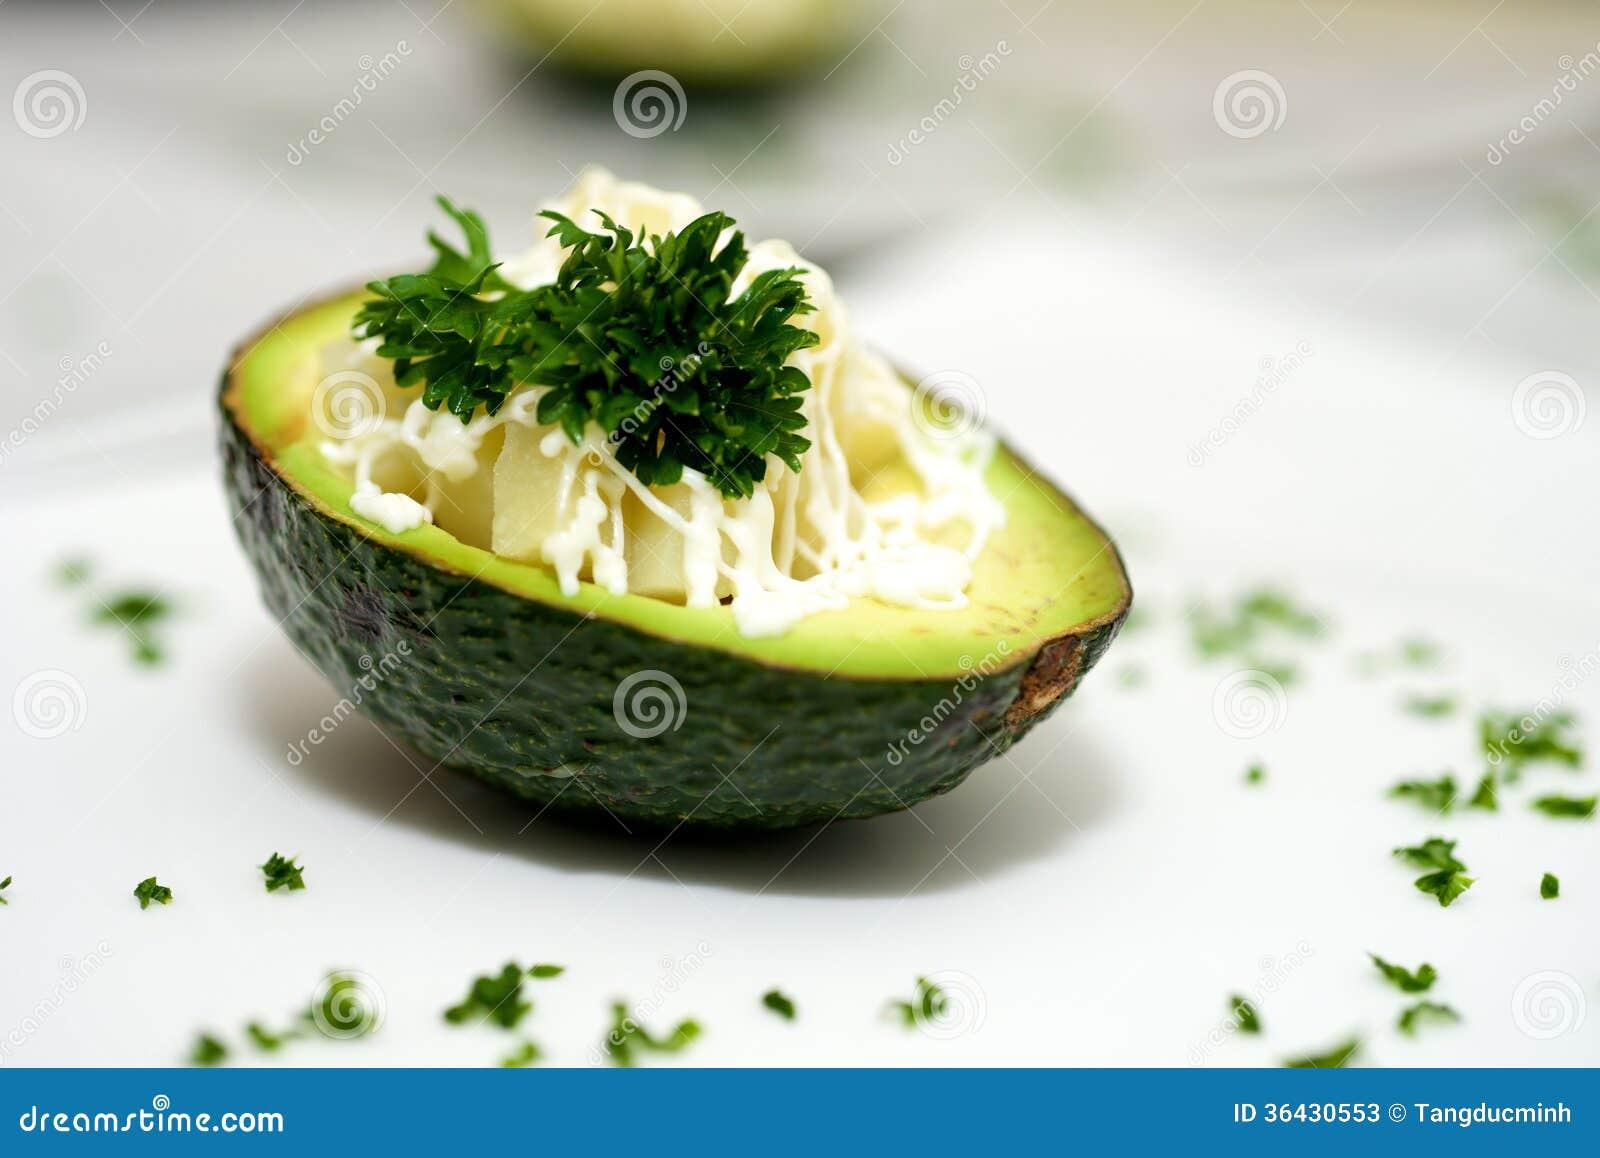 Avocado Dessert Stock Photos - Image: 36430553